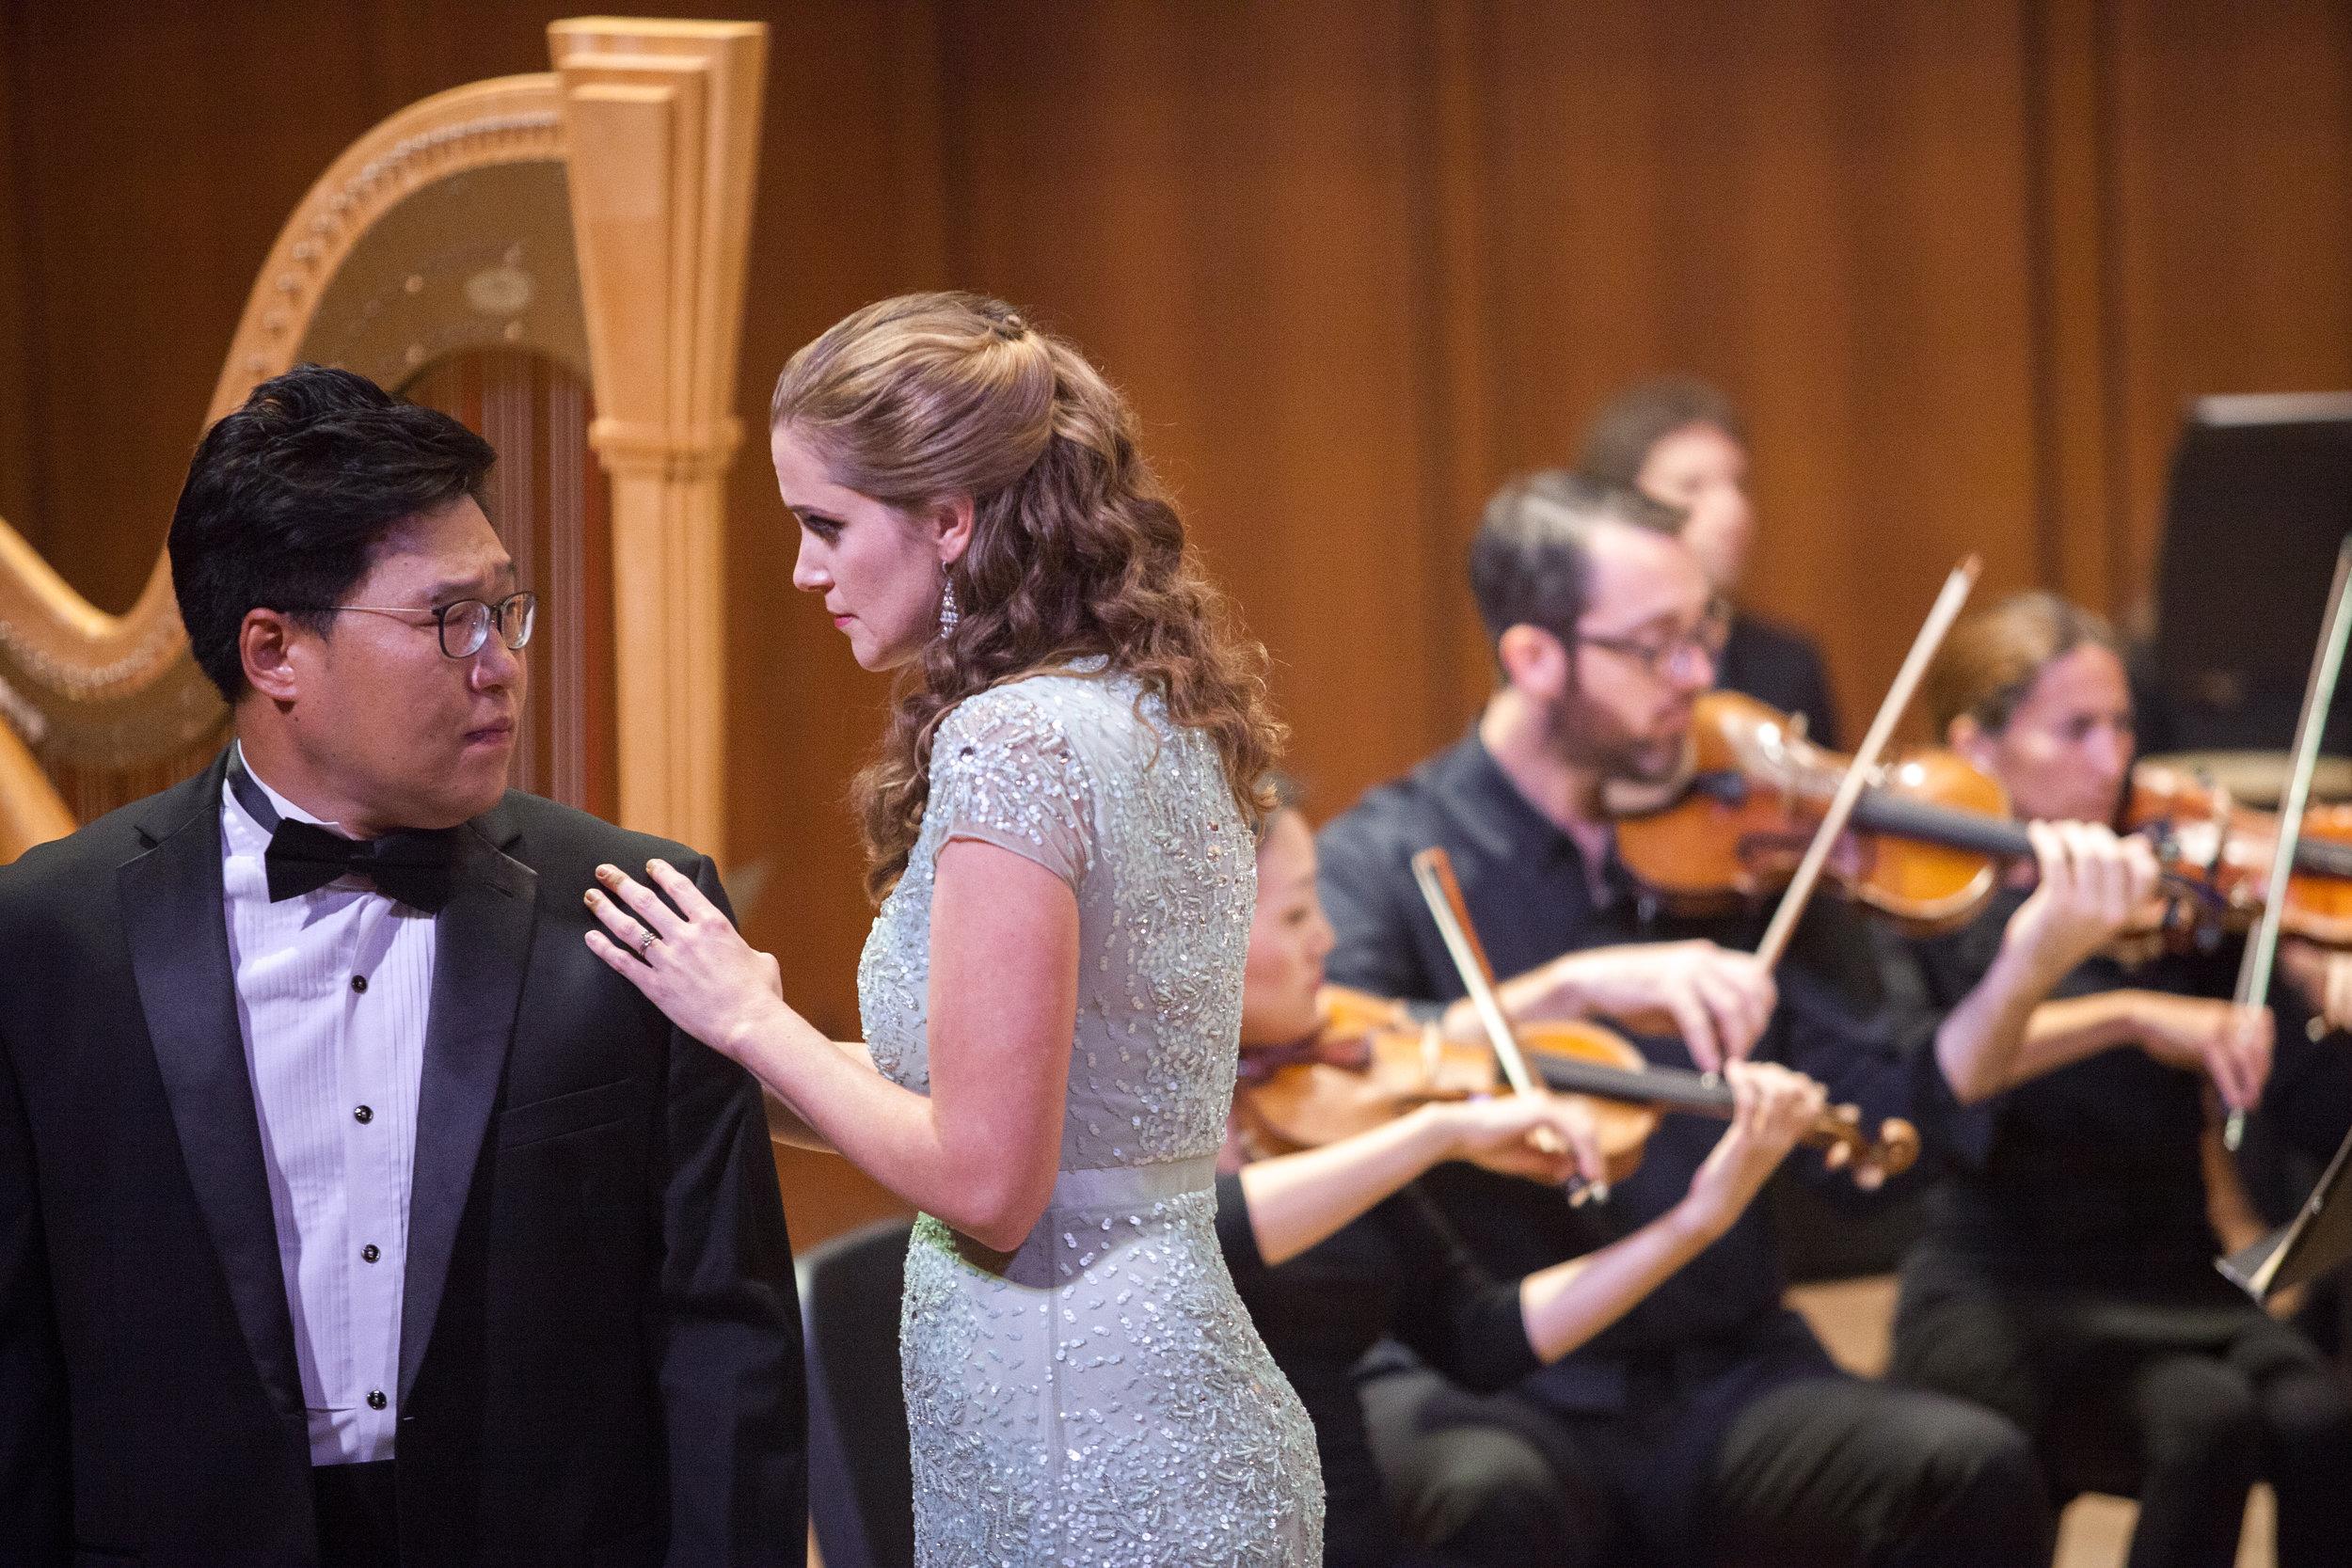 Julia Tyler, soprano, and Soonchan Kwon, tenor, singing a duet.